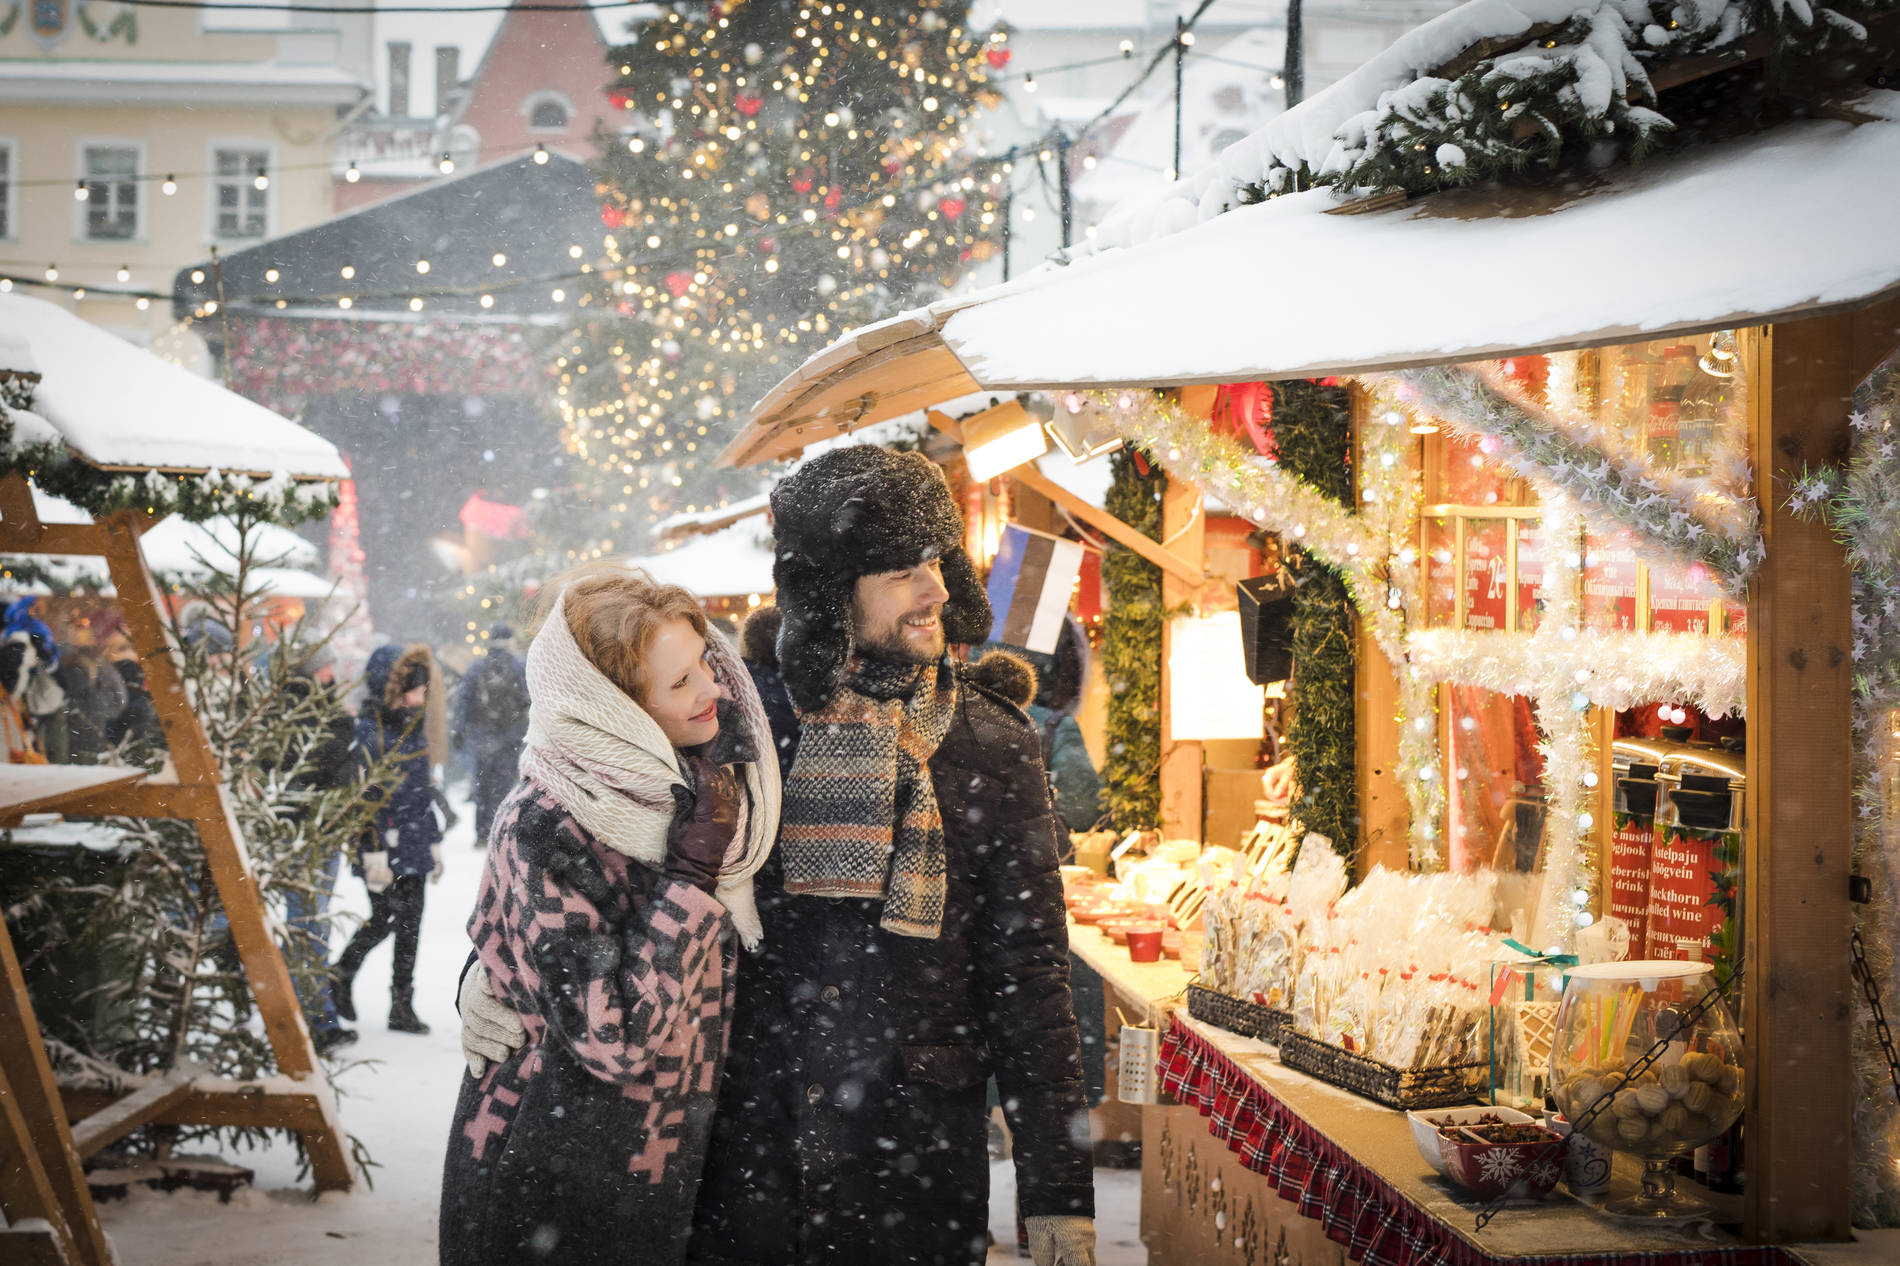 A couple at the Christmas market of Tallinn, Estonia